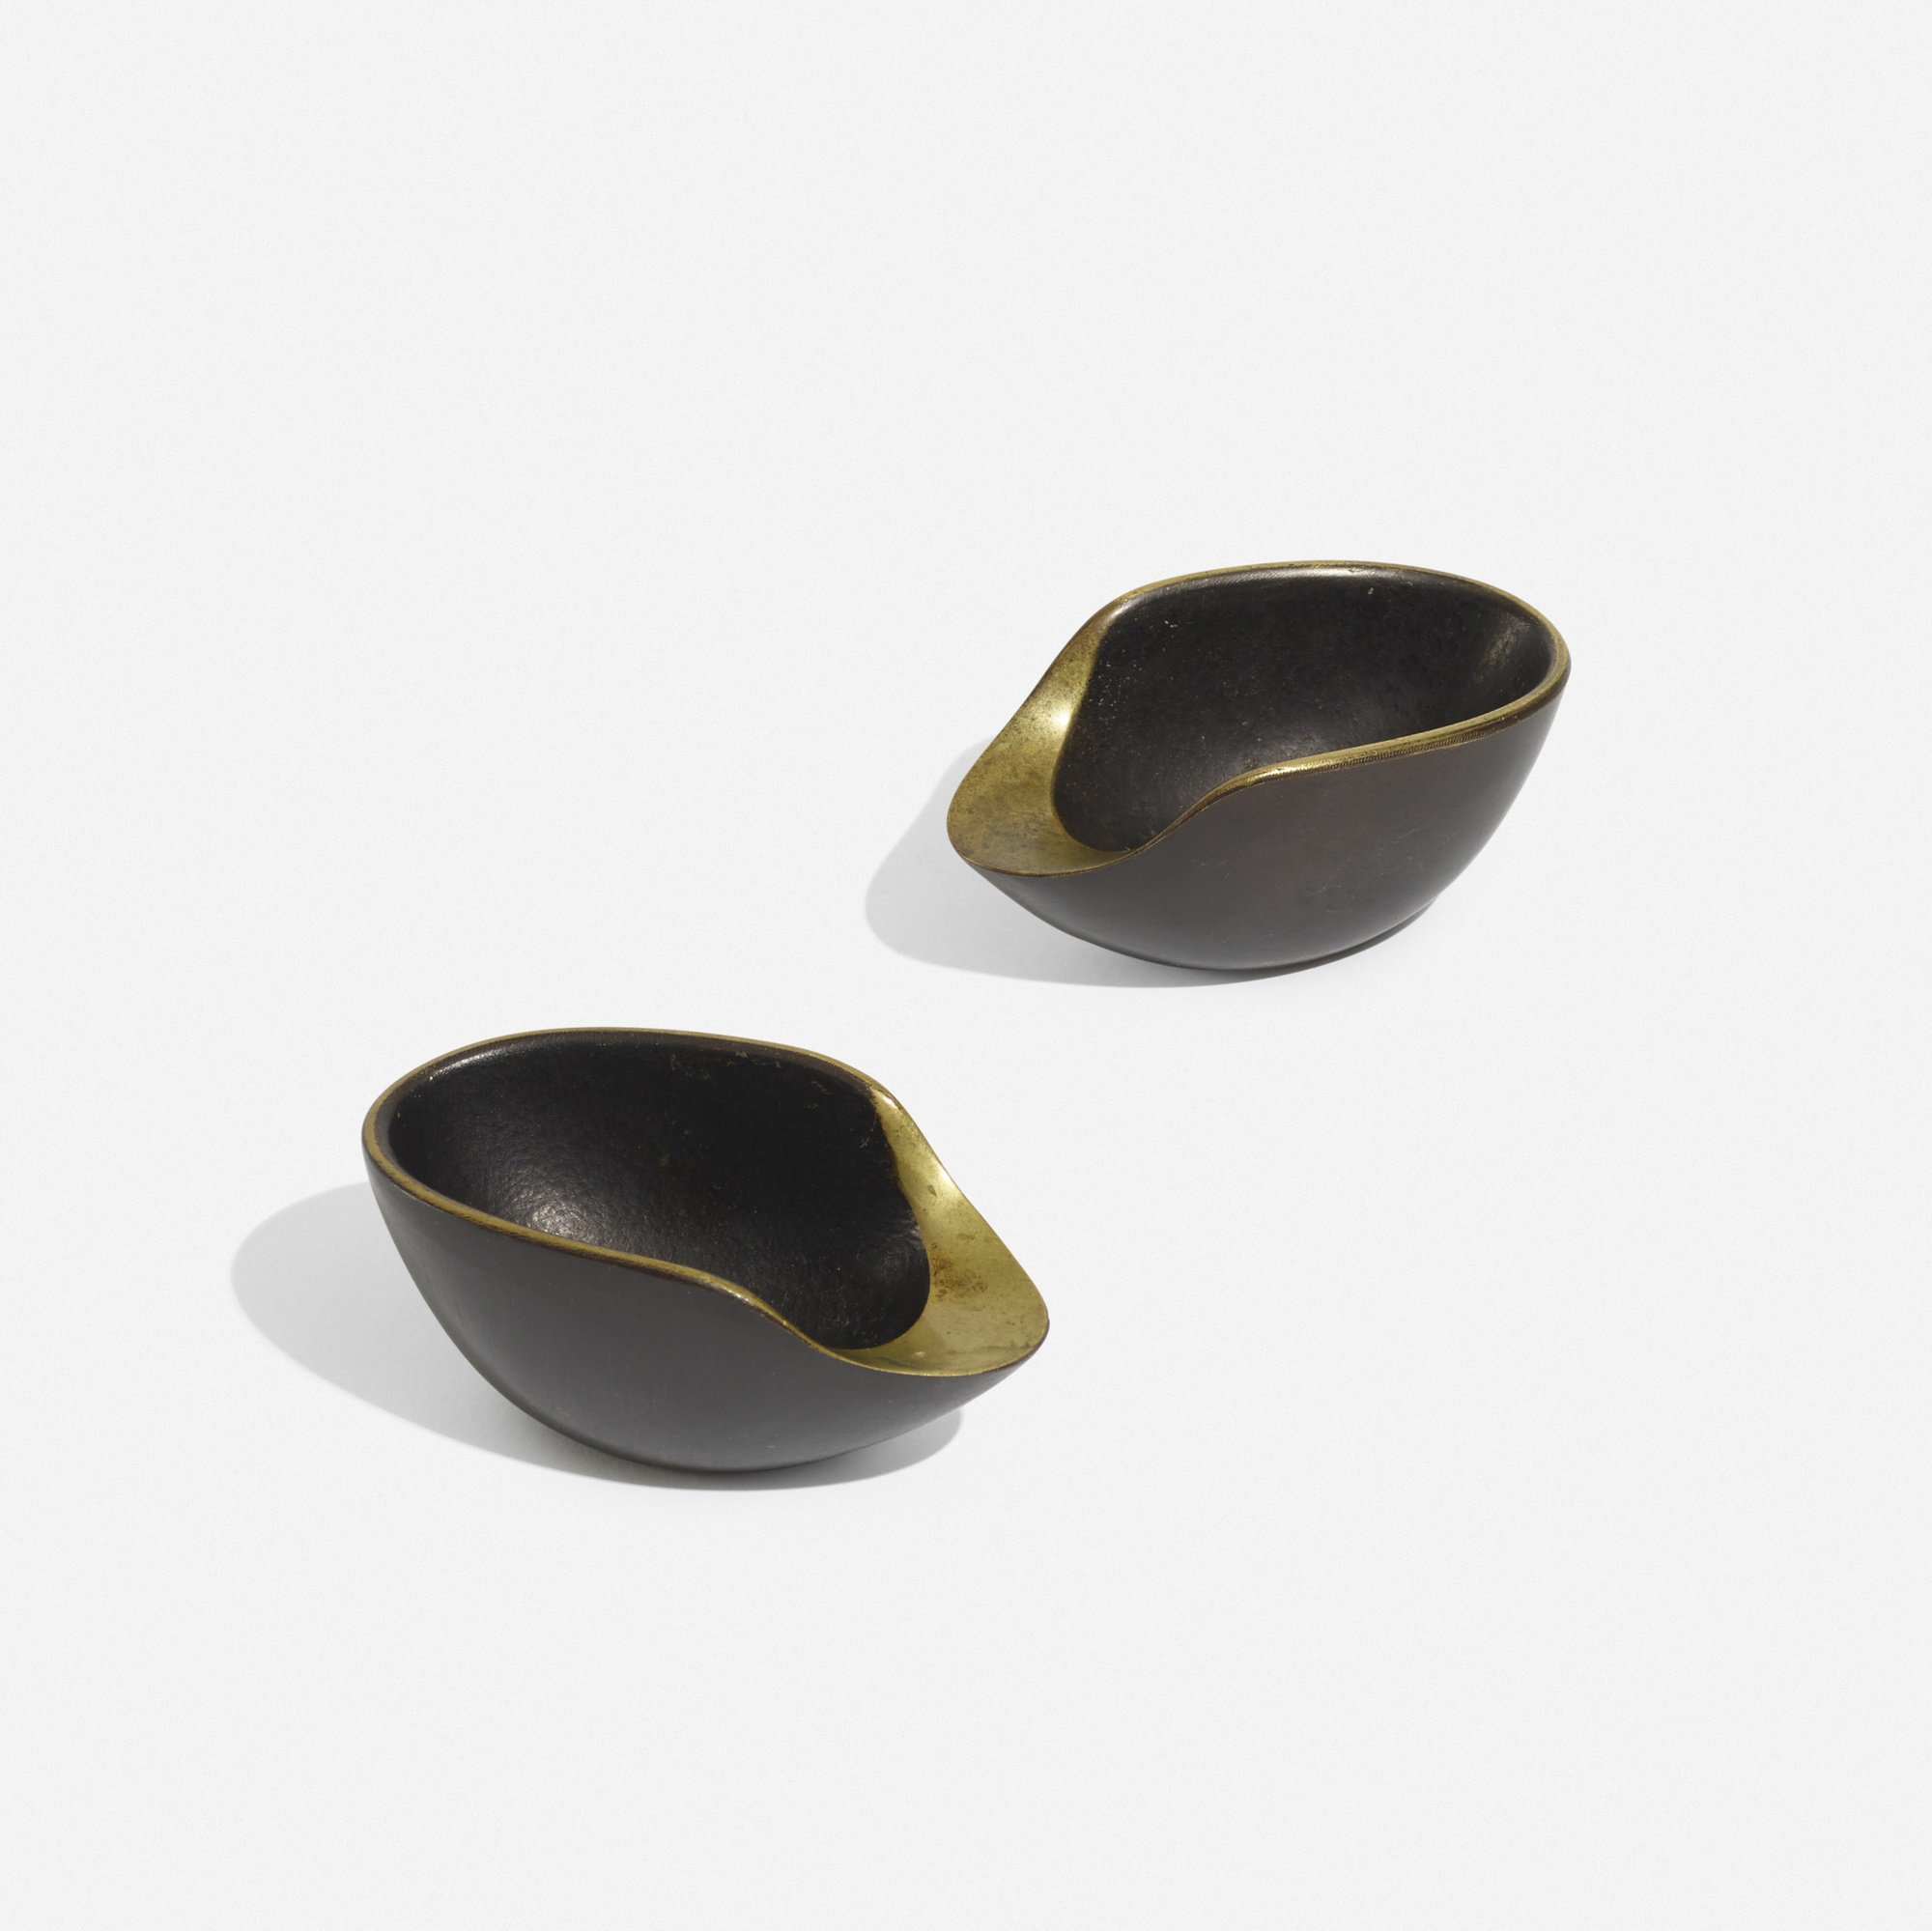 187: Carl Auböck II / ashtrays model 3597, pair (1 of 3)